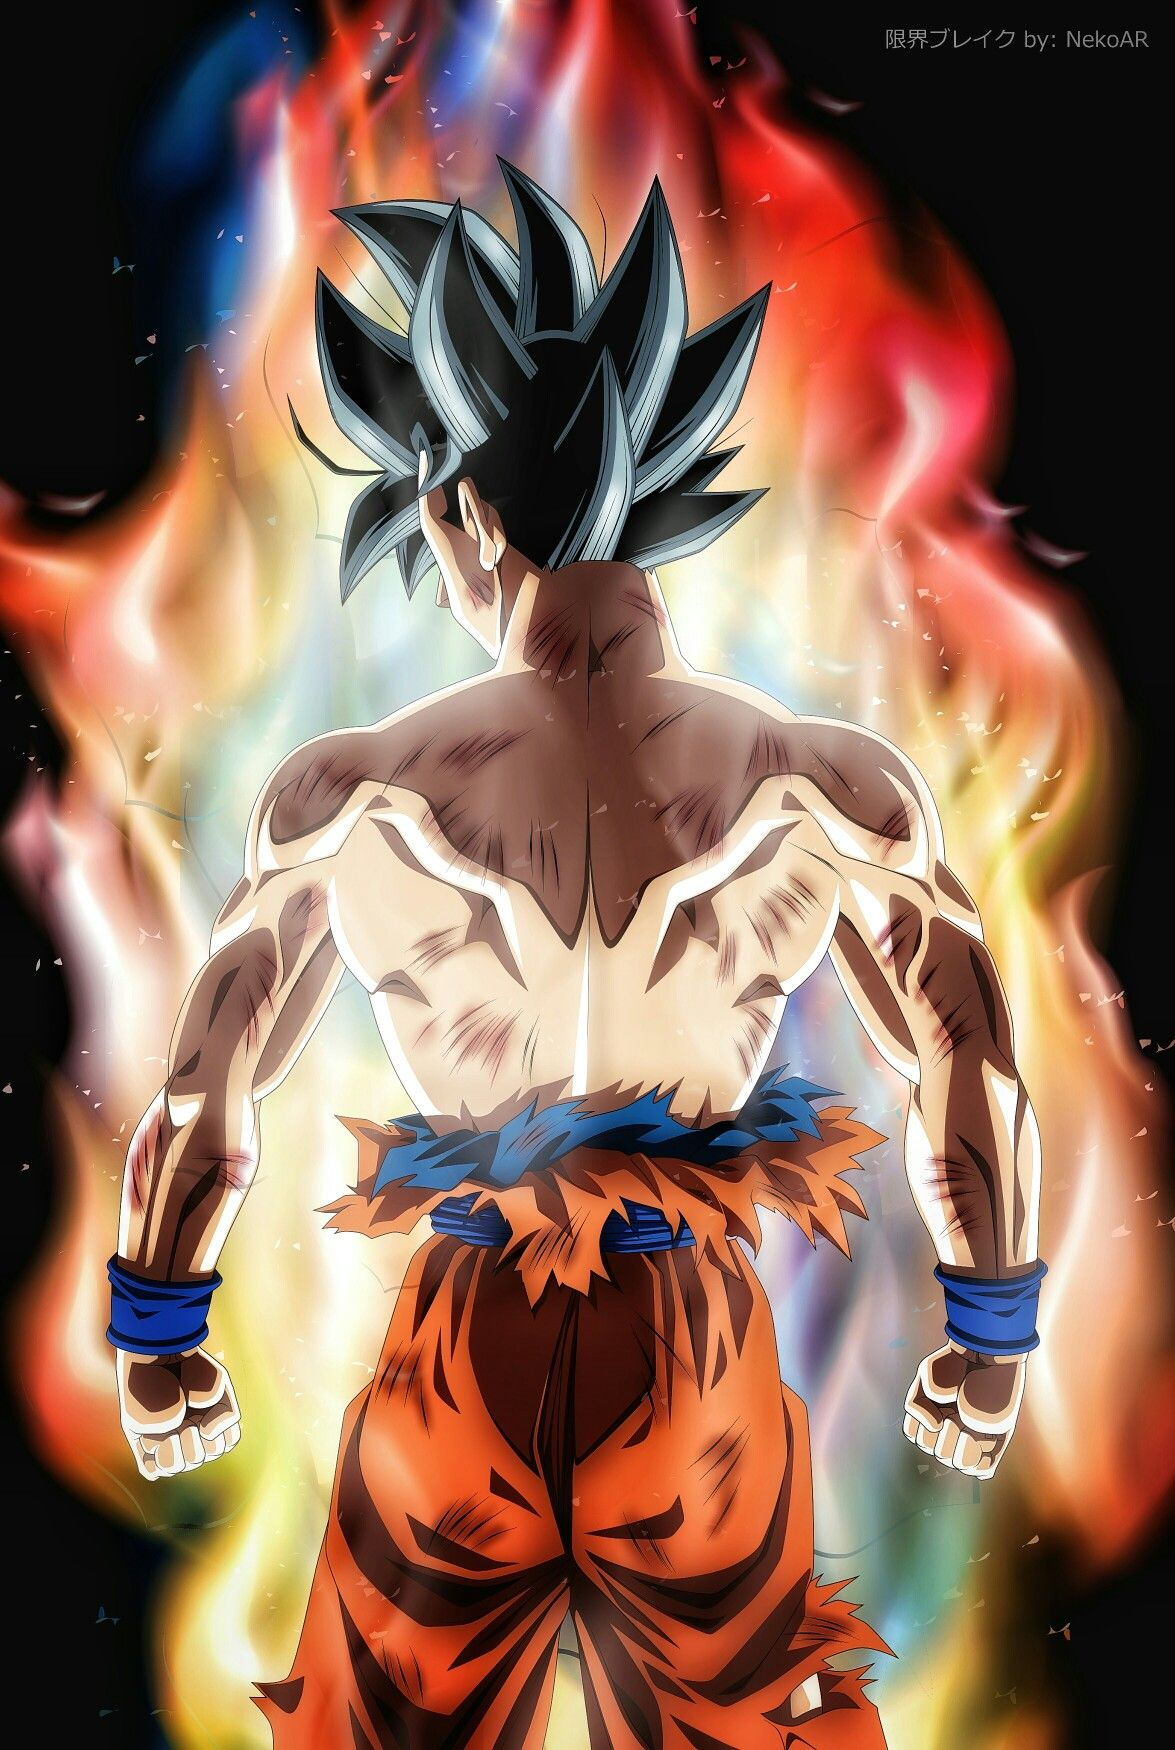 Goku New Transformation Dragonball Super Universe Survival Arc And Tournament Of Power Dragon Ball Super Goku Dragon Ball Goku Dragon Ball